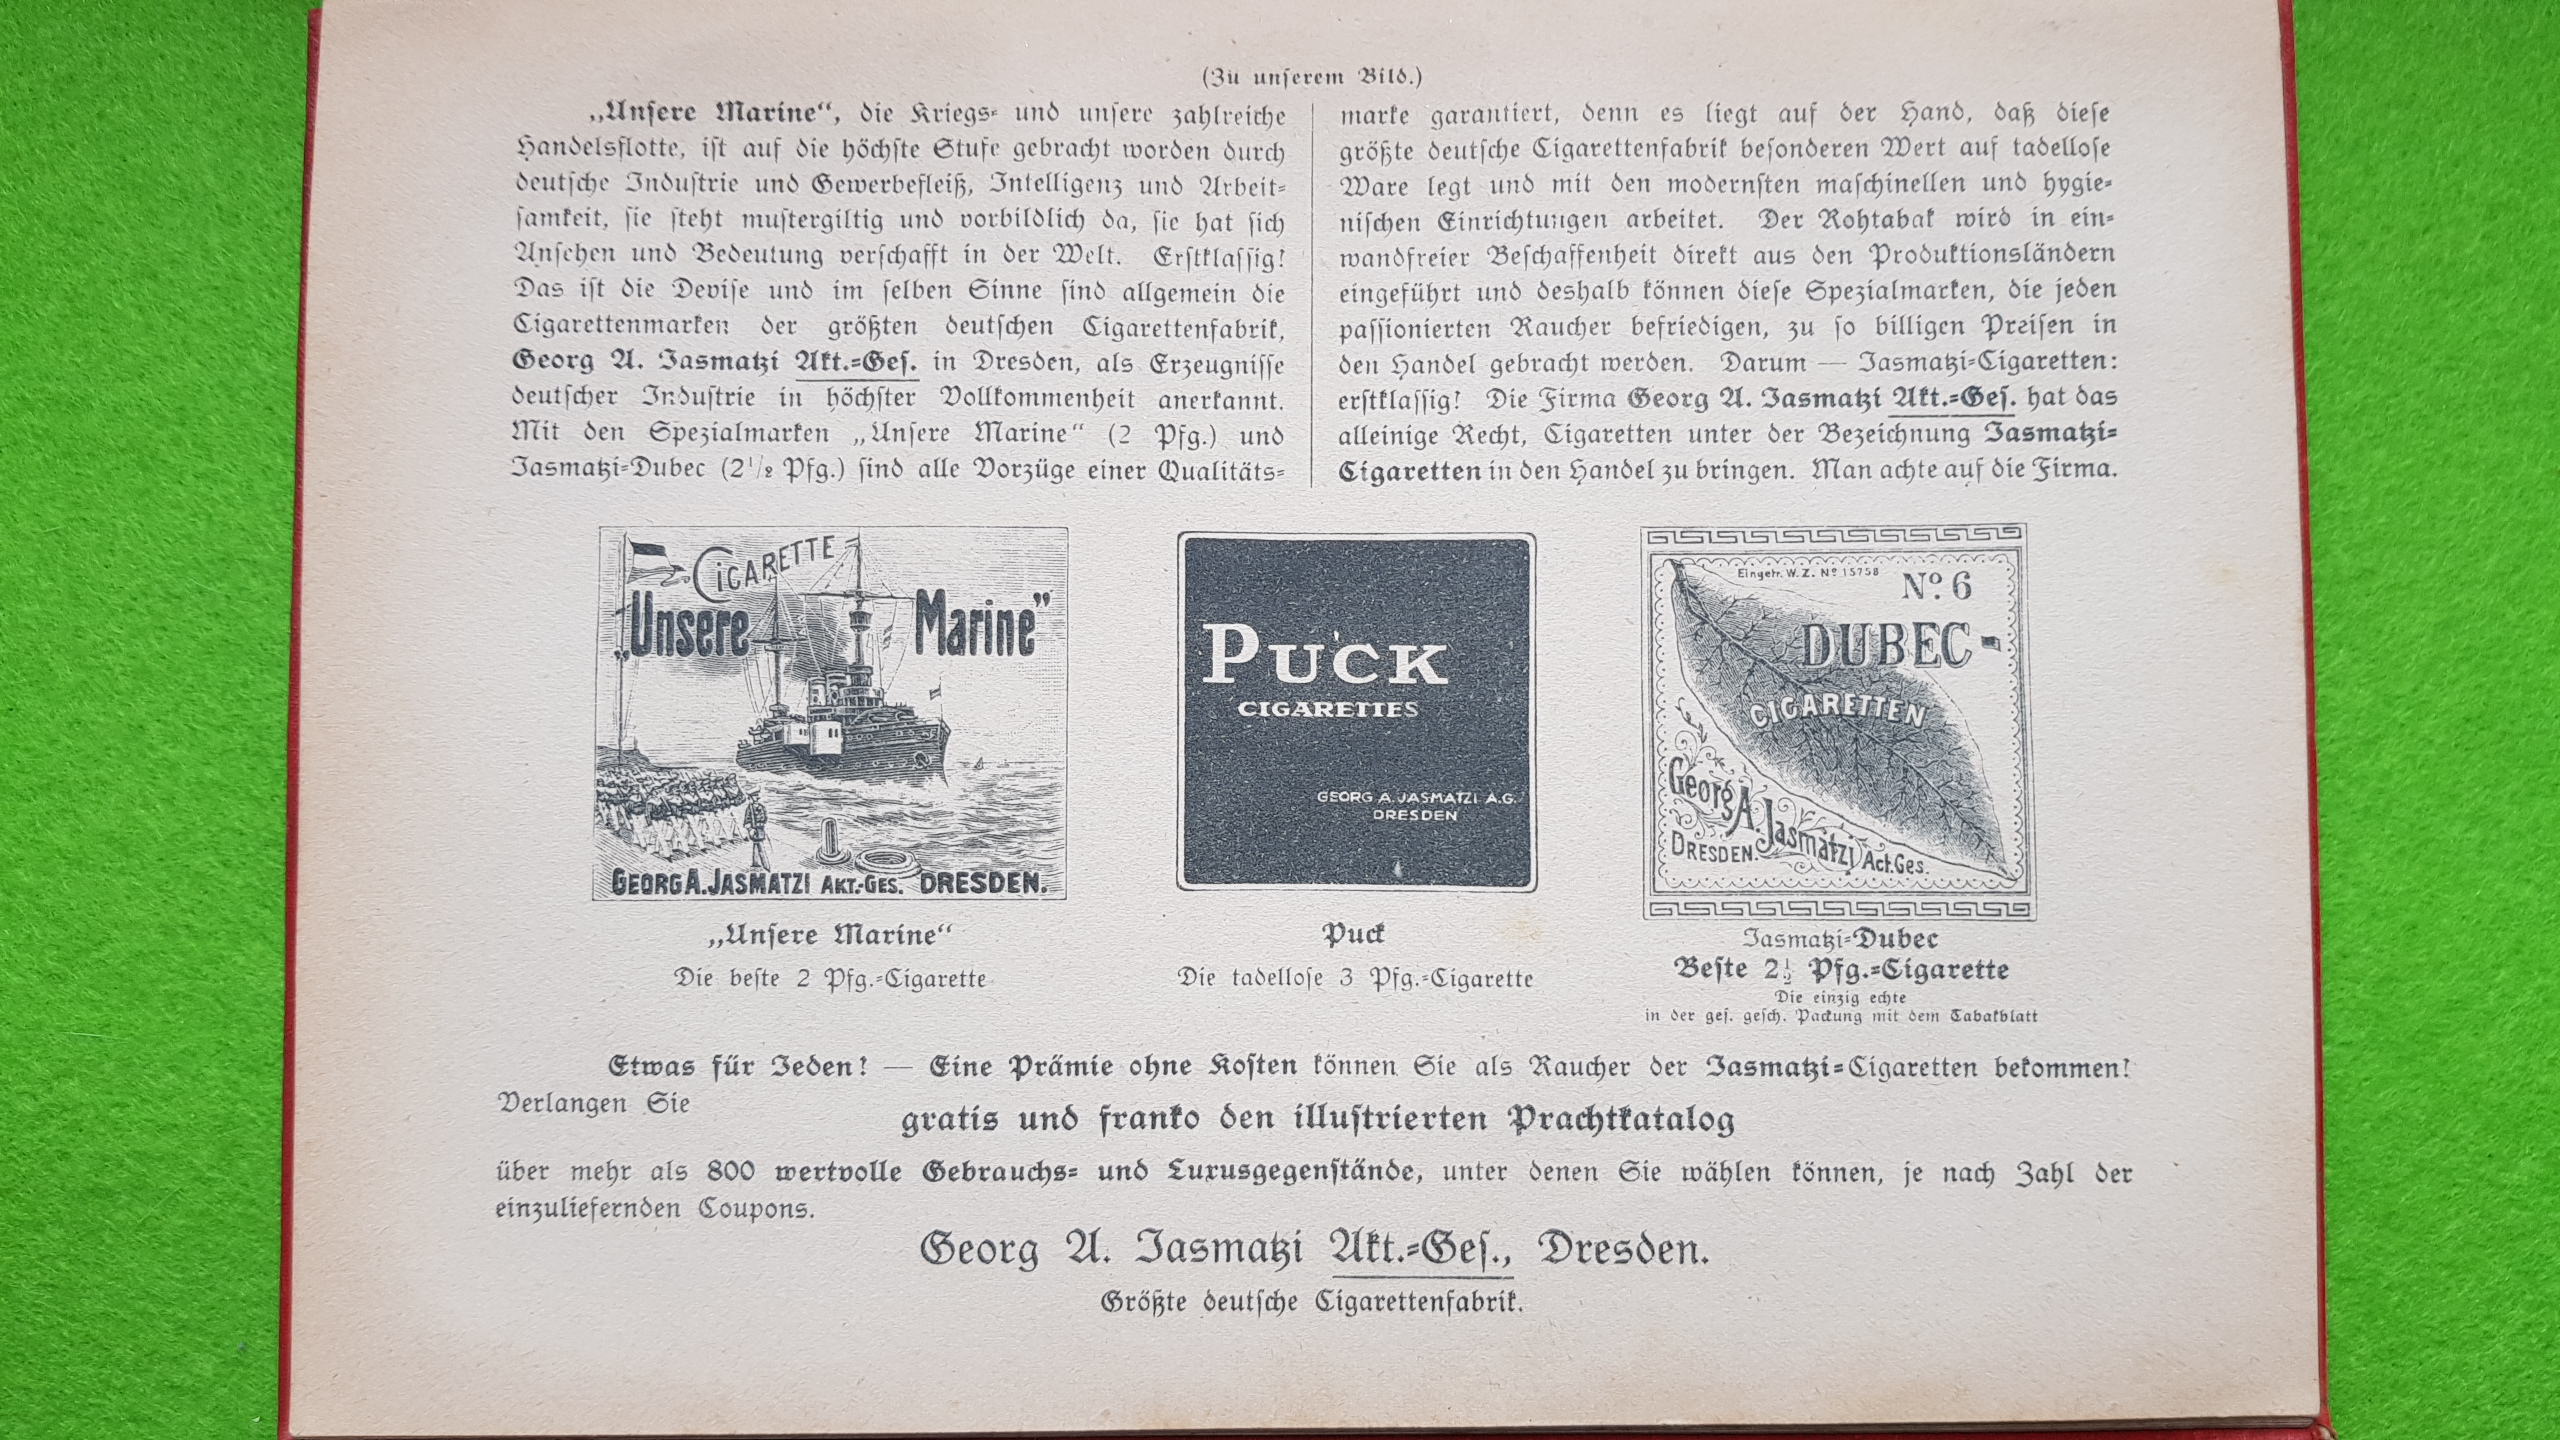 Großer Volkskalender des Lahrer hinkenden Boten - 1914 - Werbung Jasmatzi